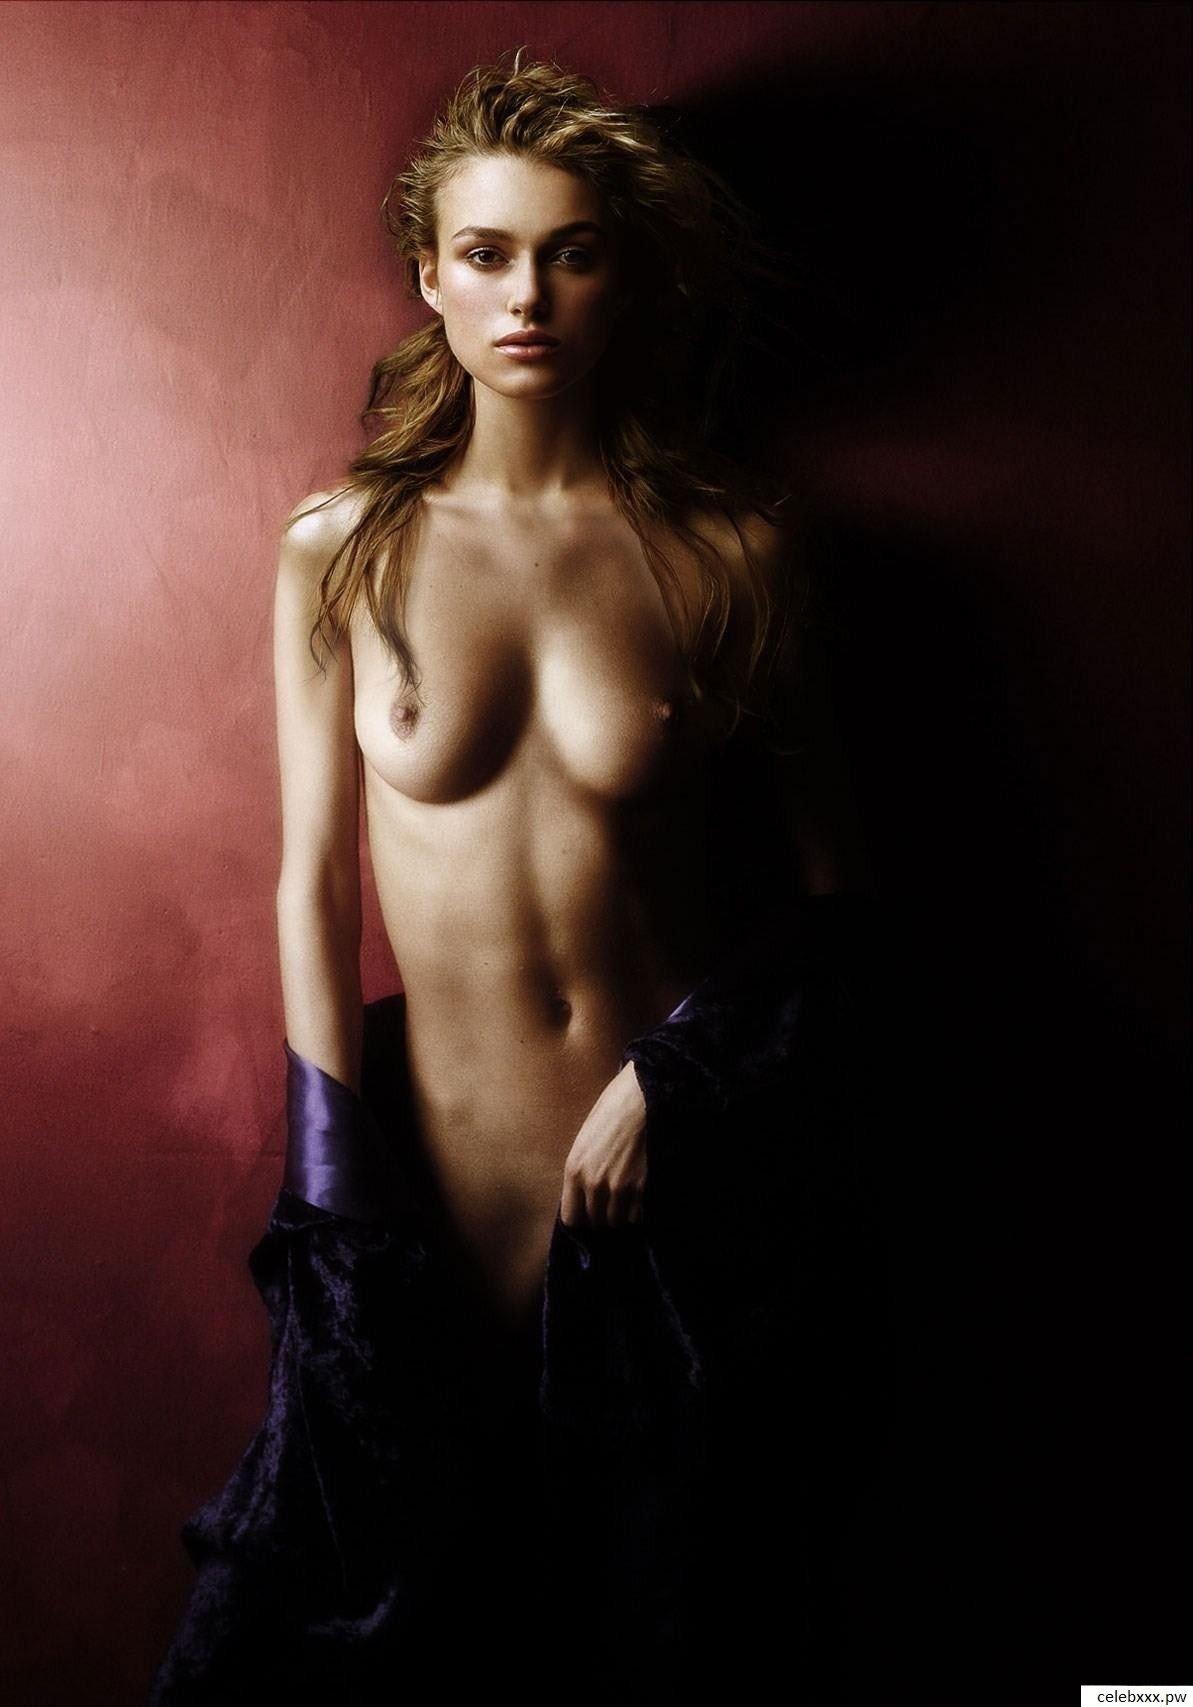 Keira nude